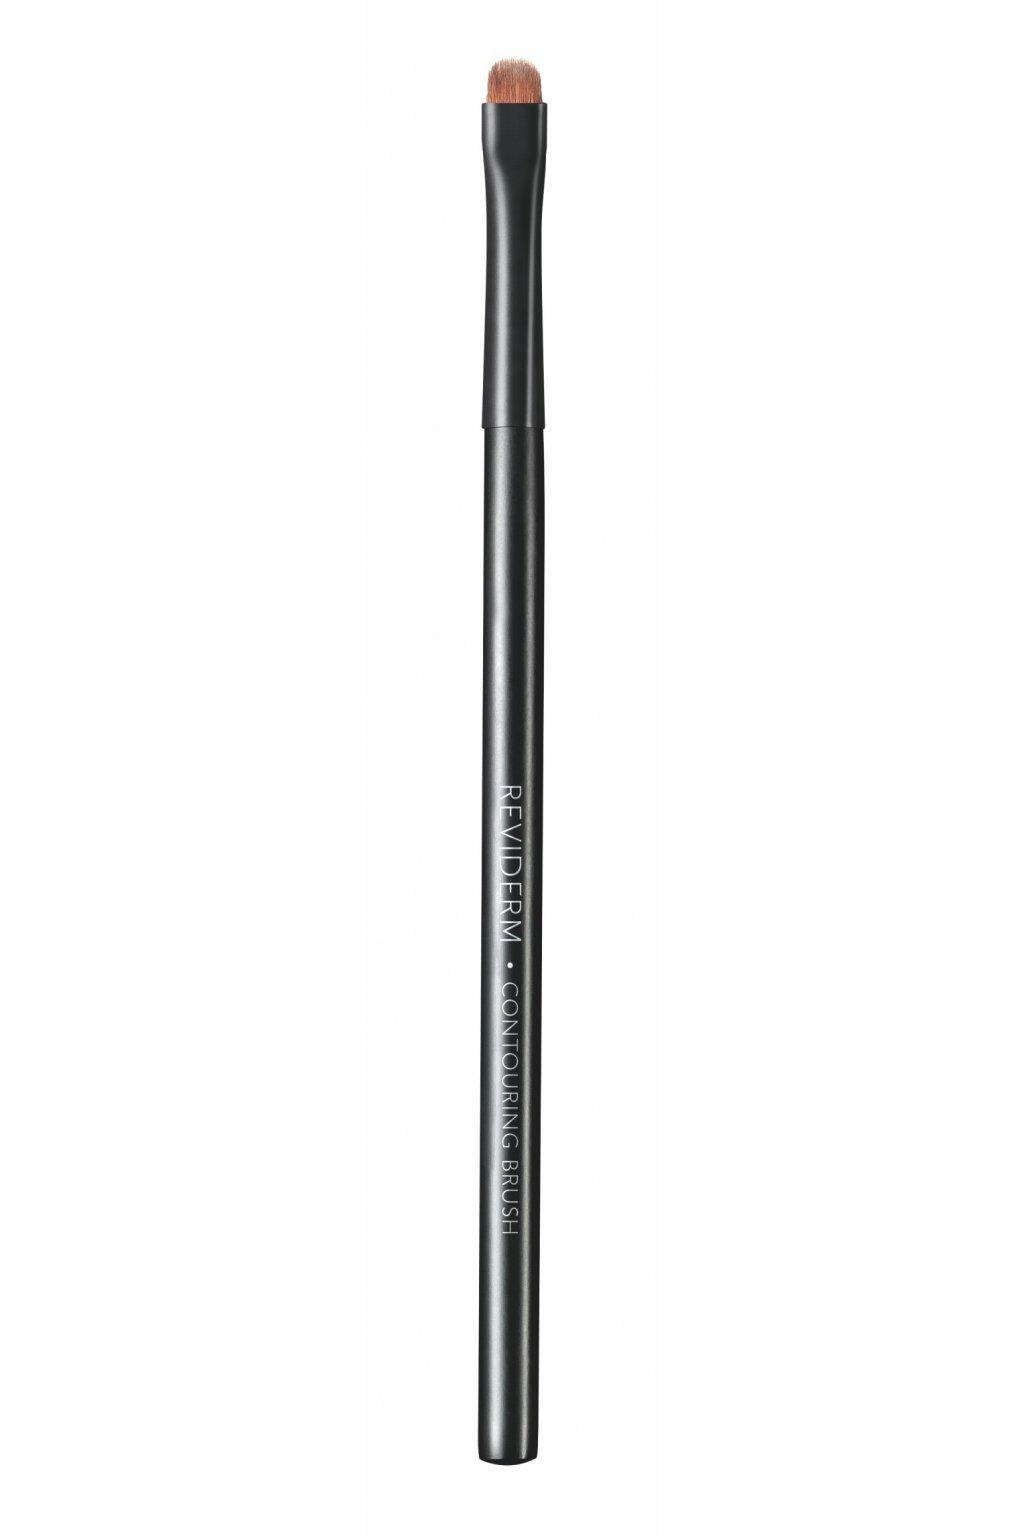 39008 Contouring Brush